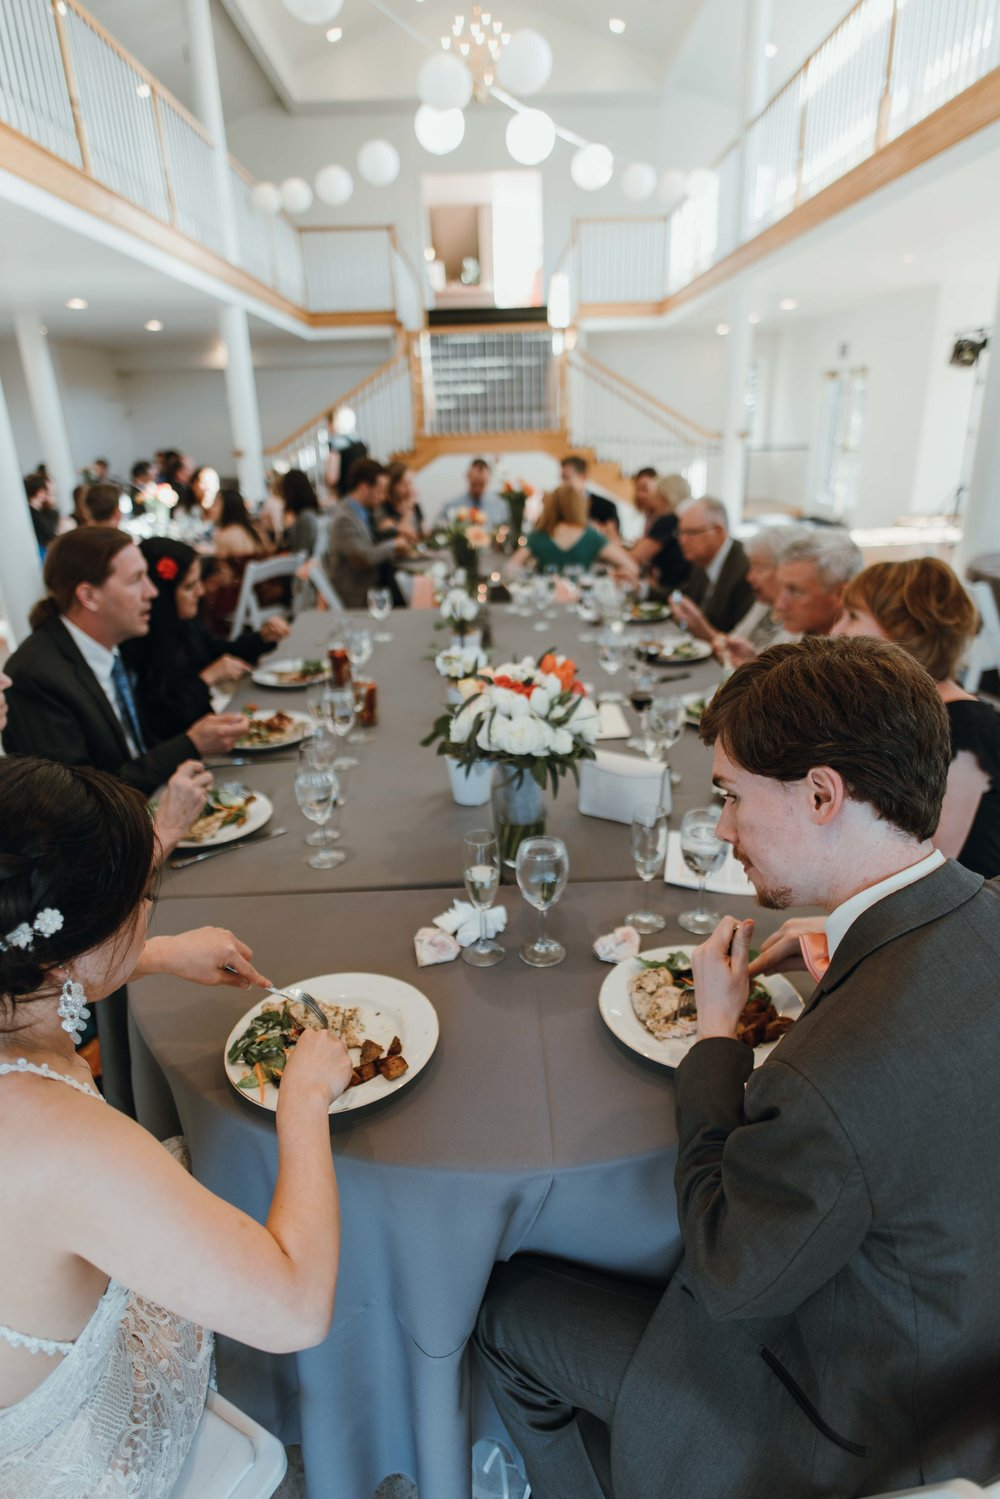 denver wedding photographer lioncrest manor in lyons ben and mali -DSC_0265.jpg